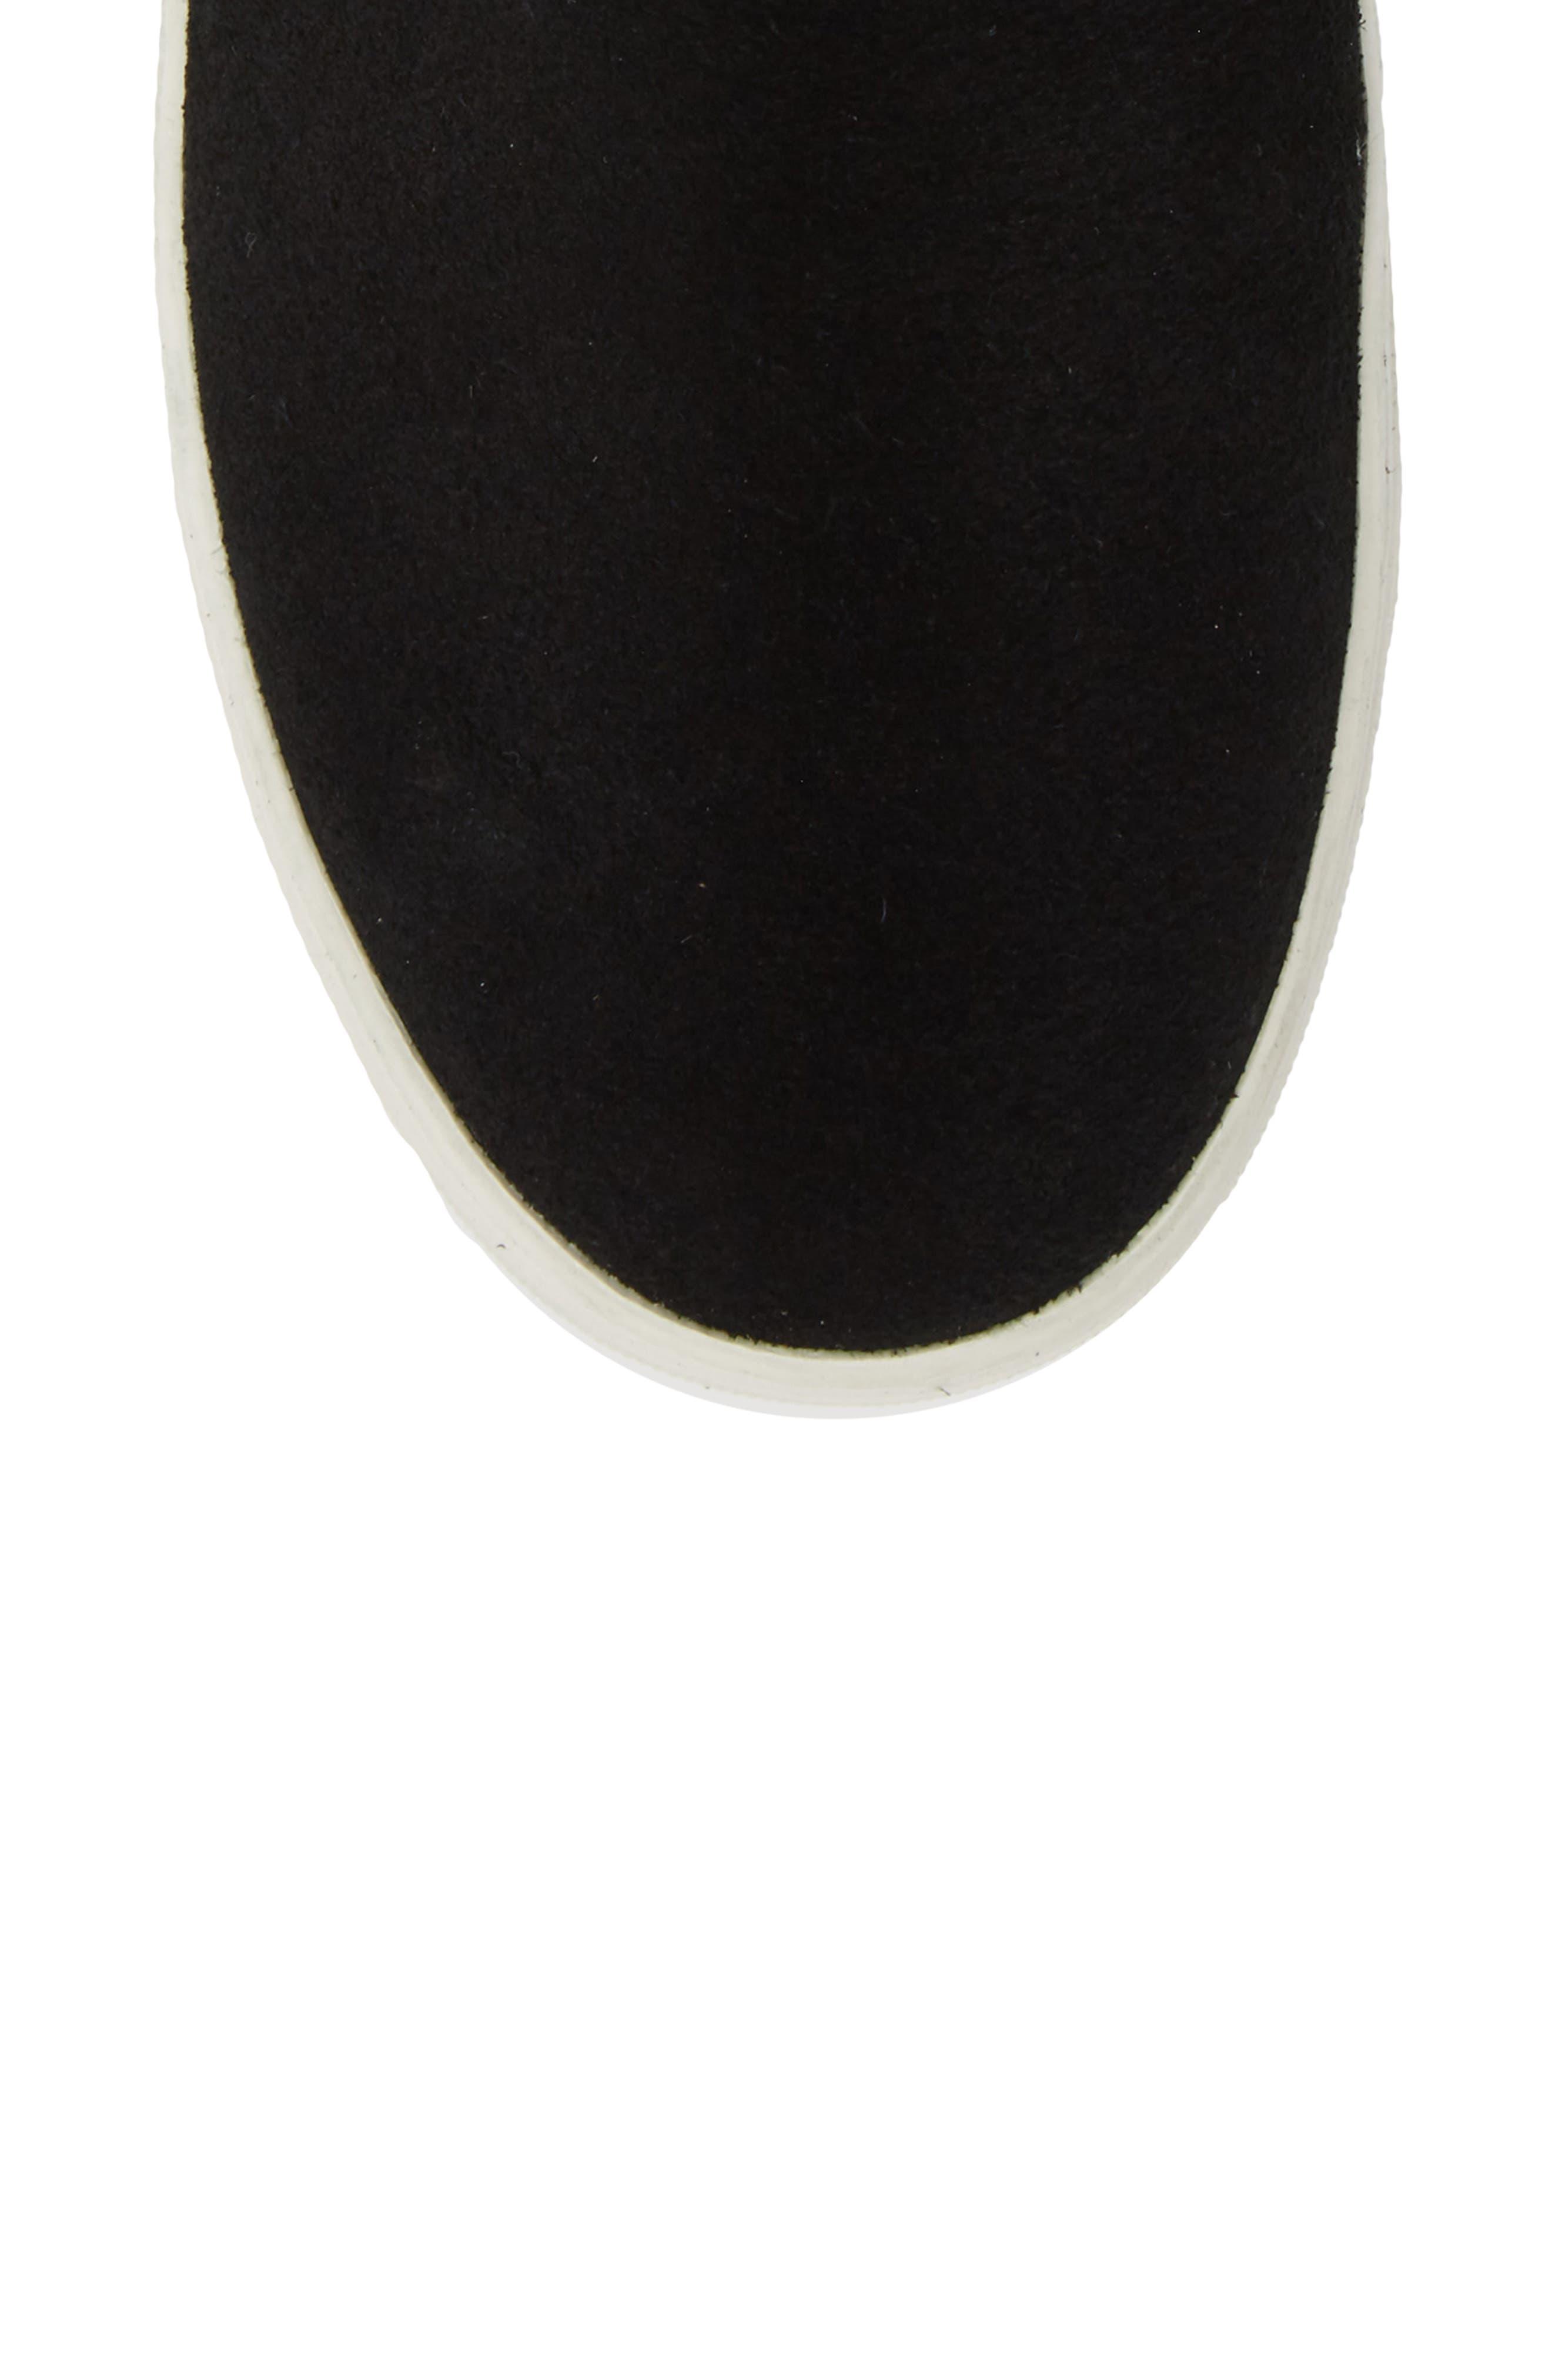 Garrson Sneaker Boot,                             Alternate thumbnail 5, color,                             006